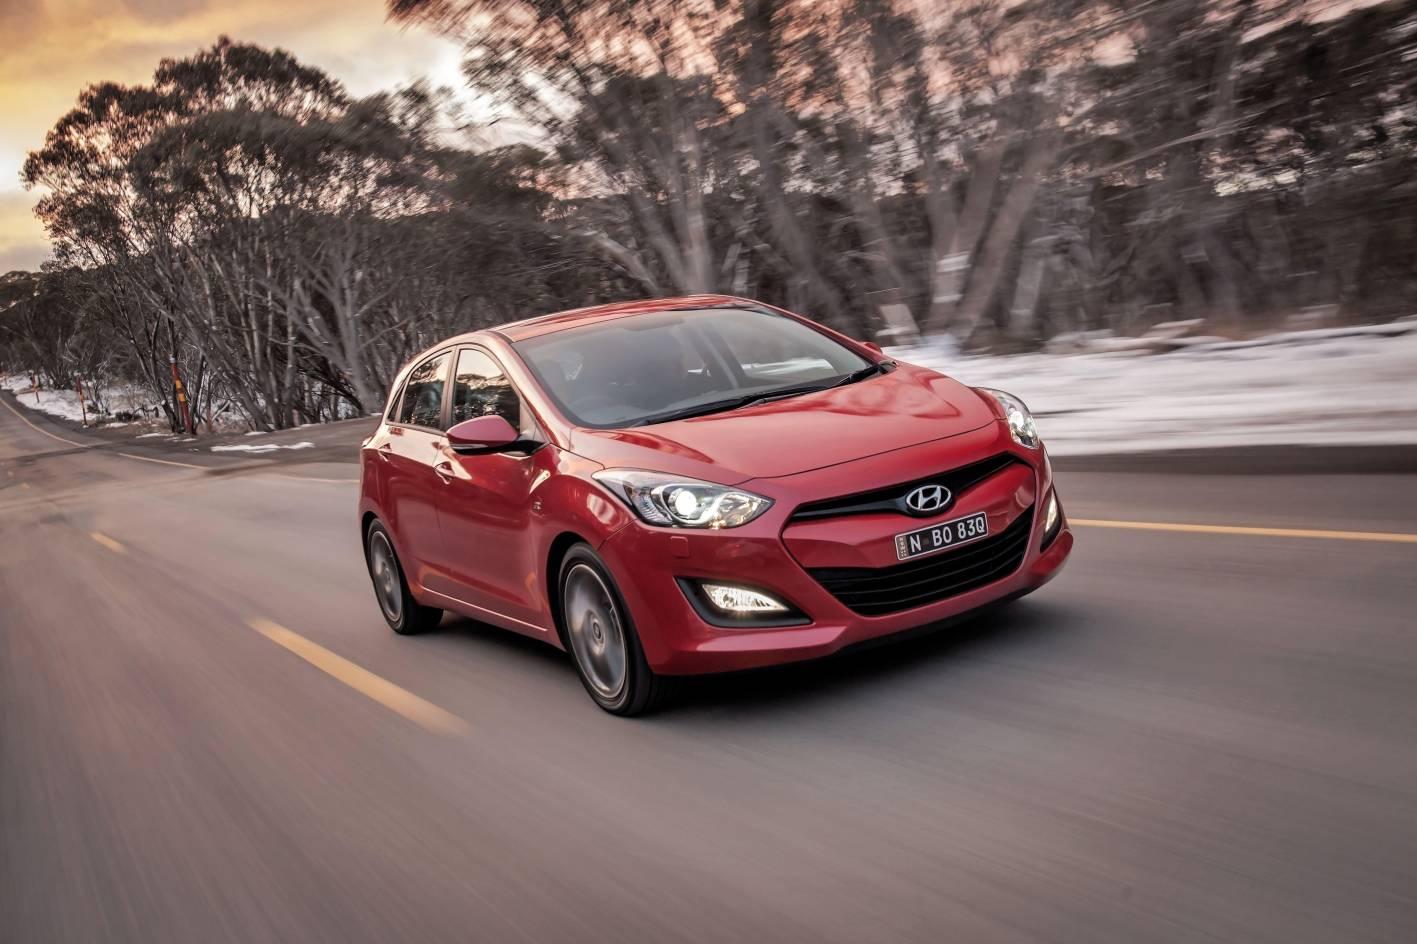 2014 Hyundai i30 SR has great driving dynamics